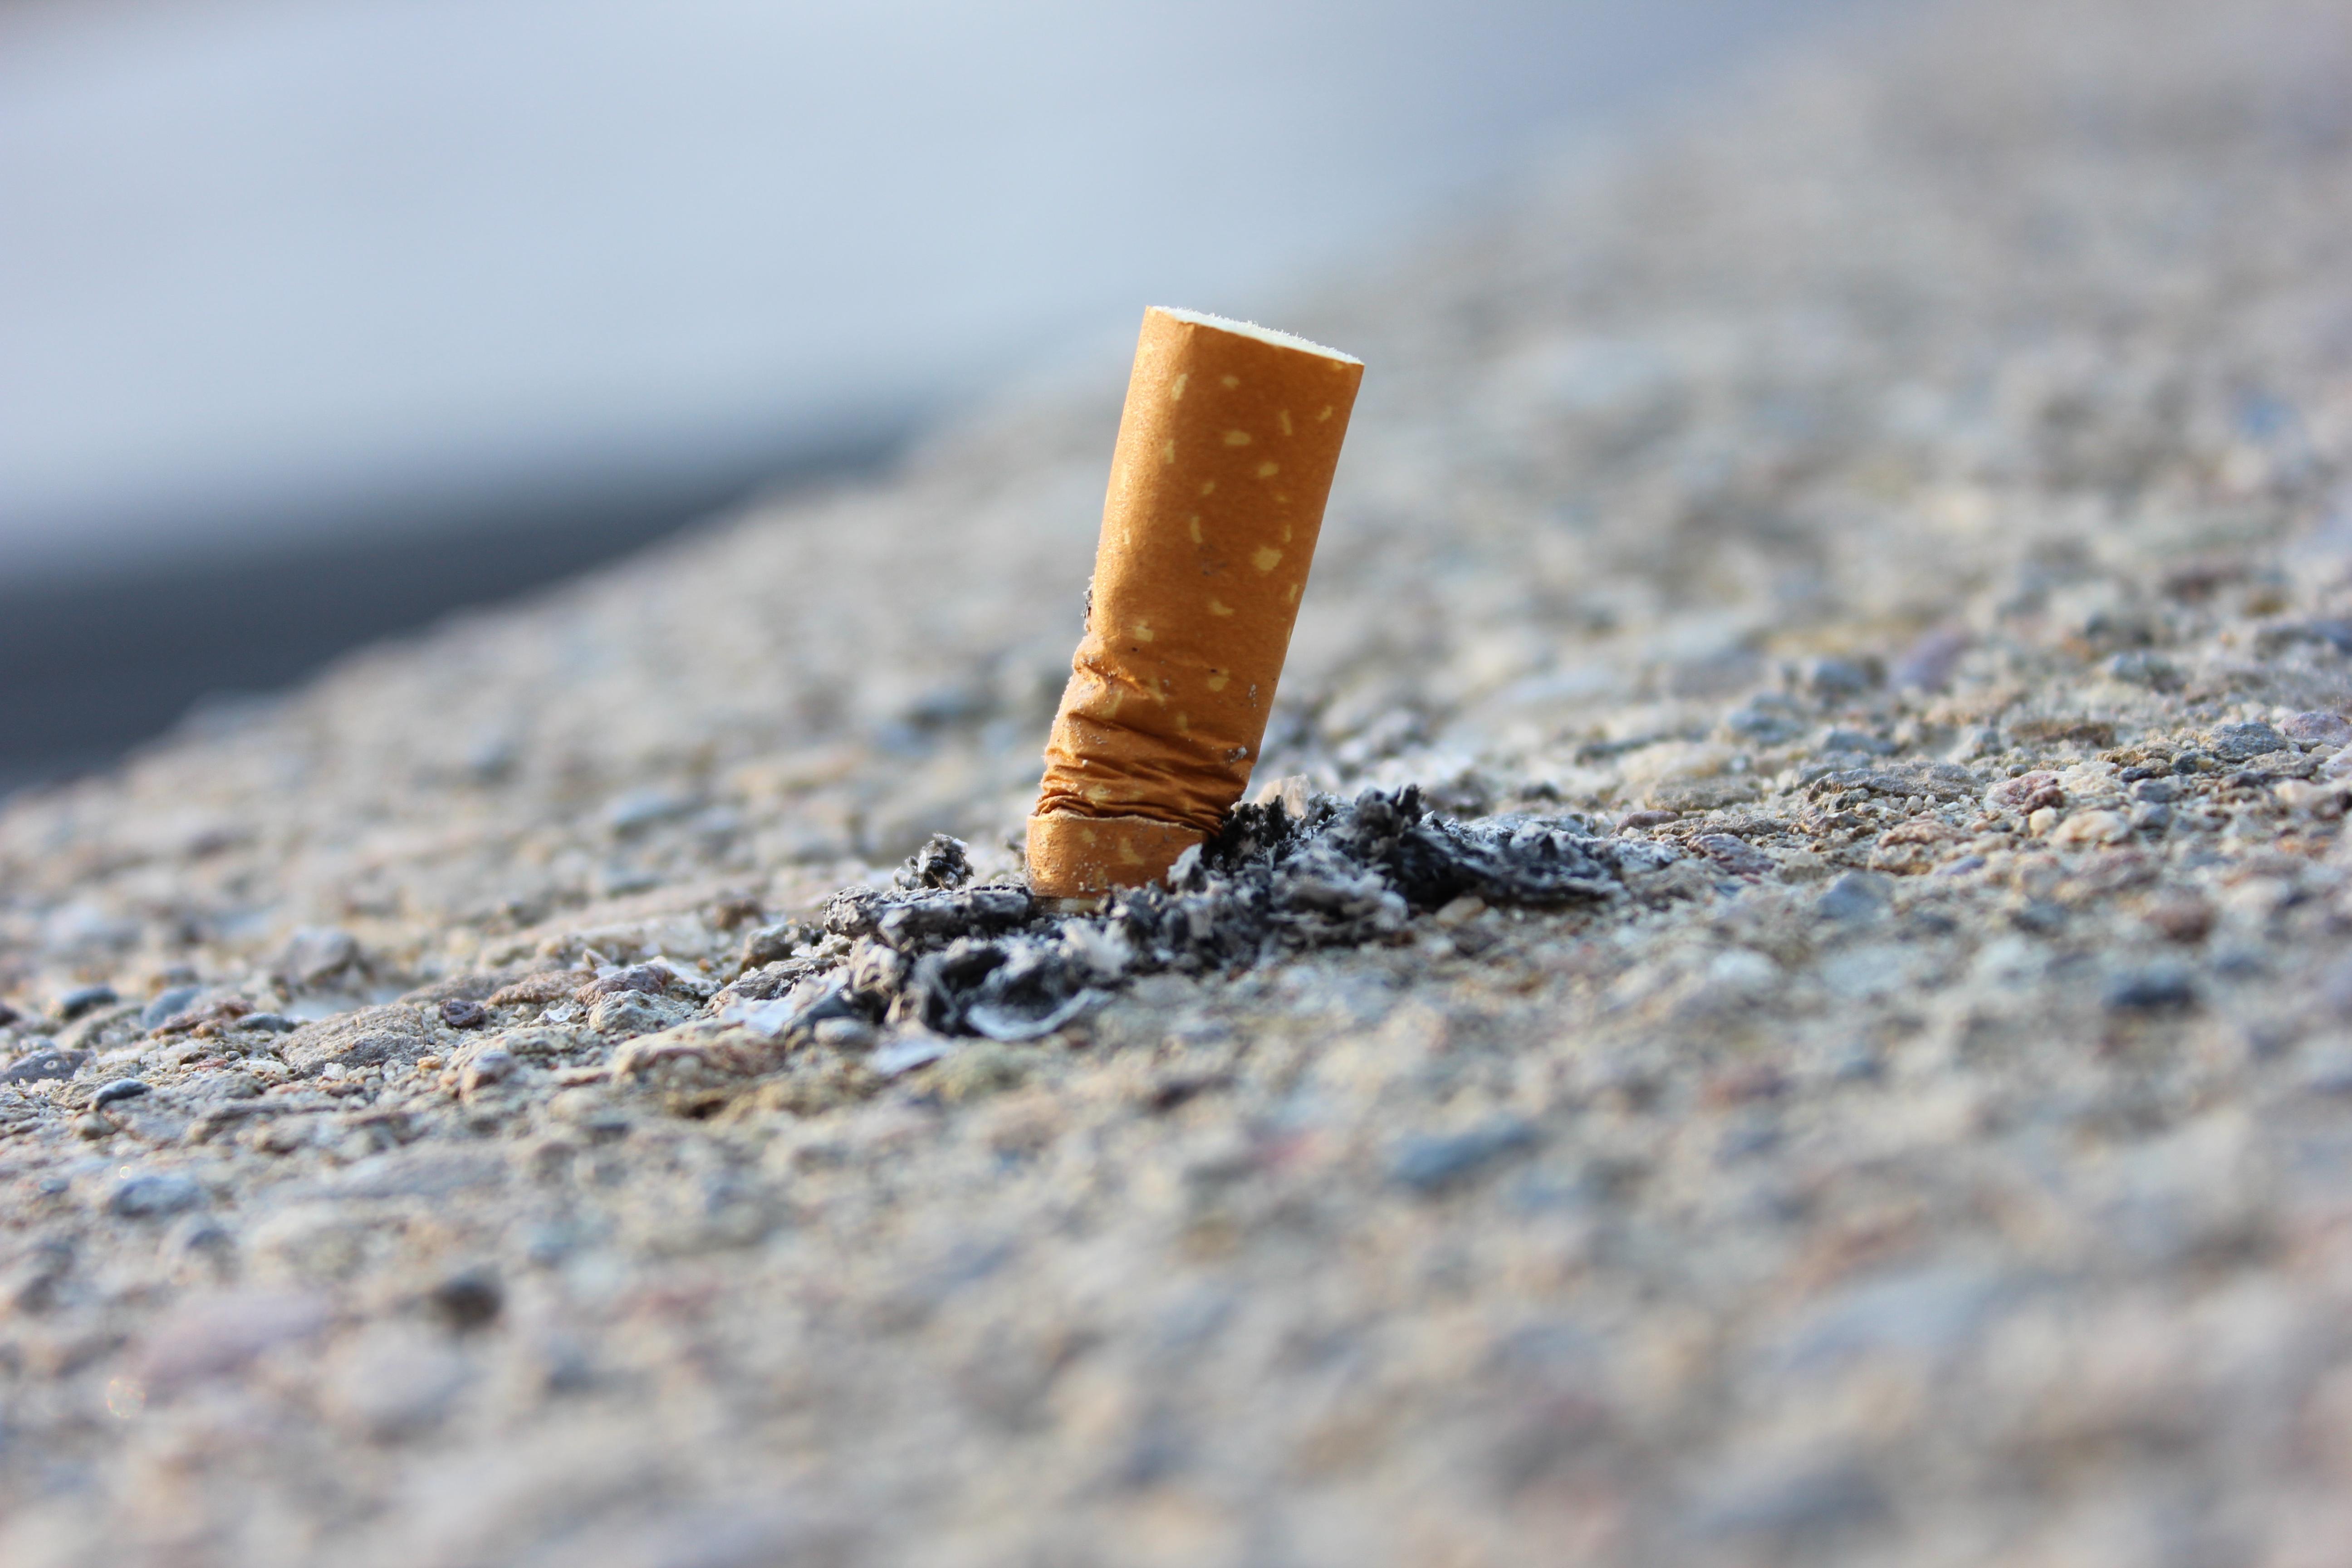 File:Cigarette Butt (26088883376).jpg - Wikimedia Commons